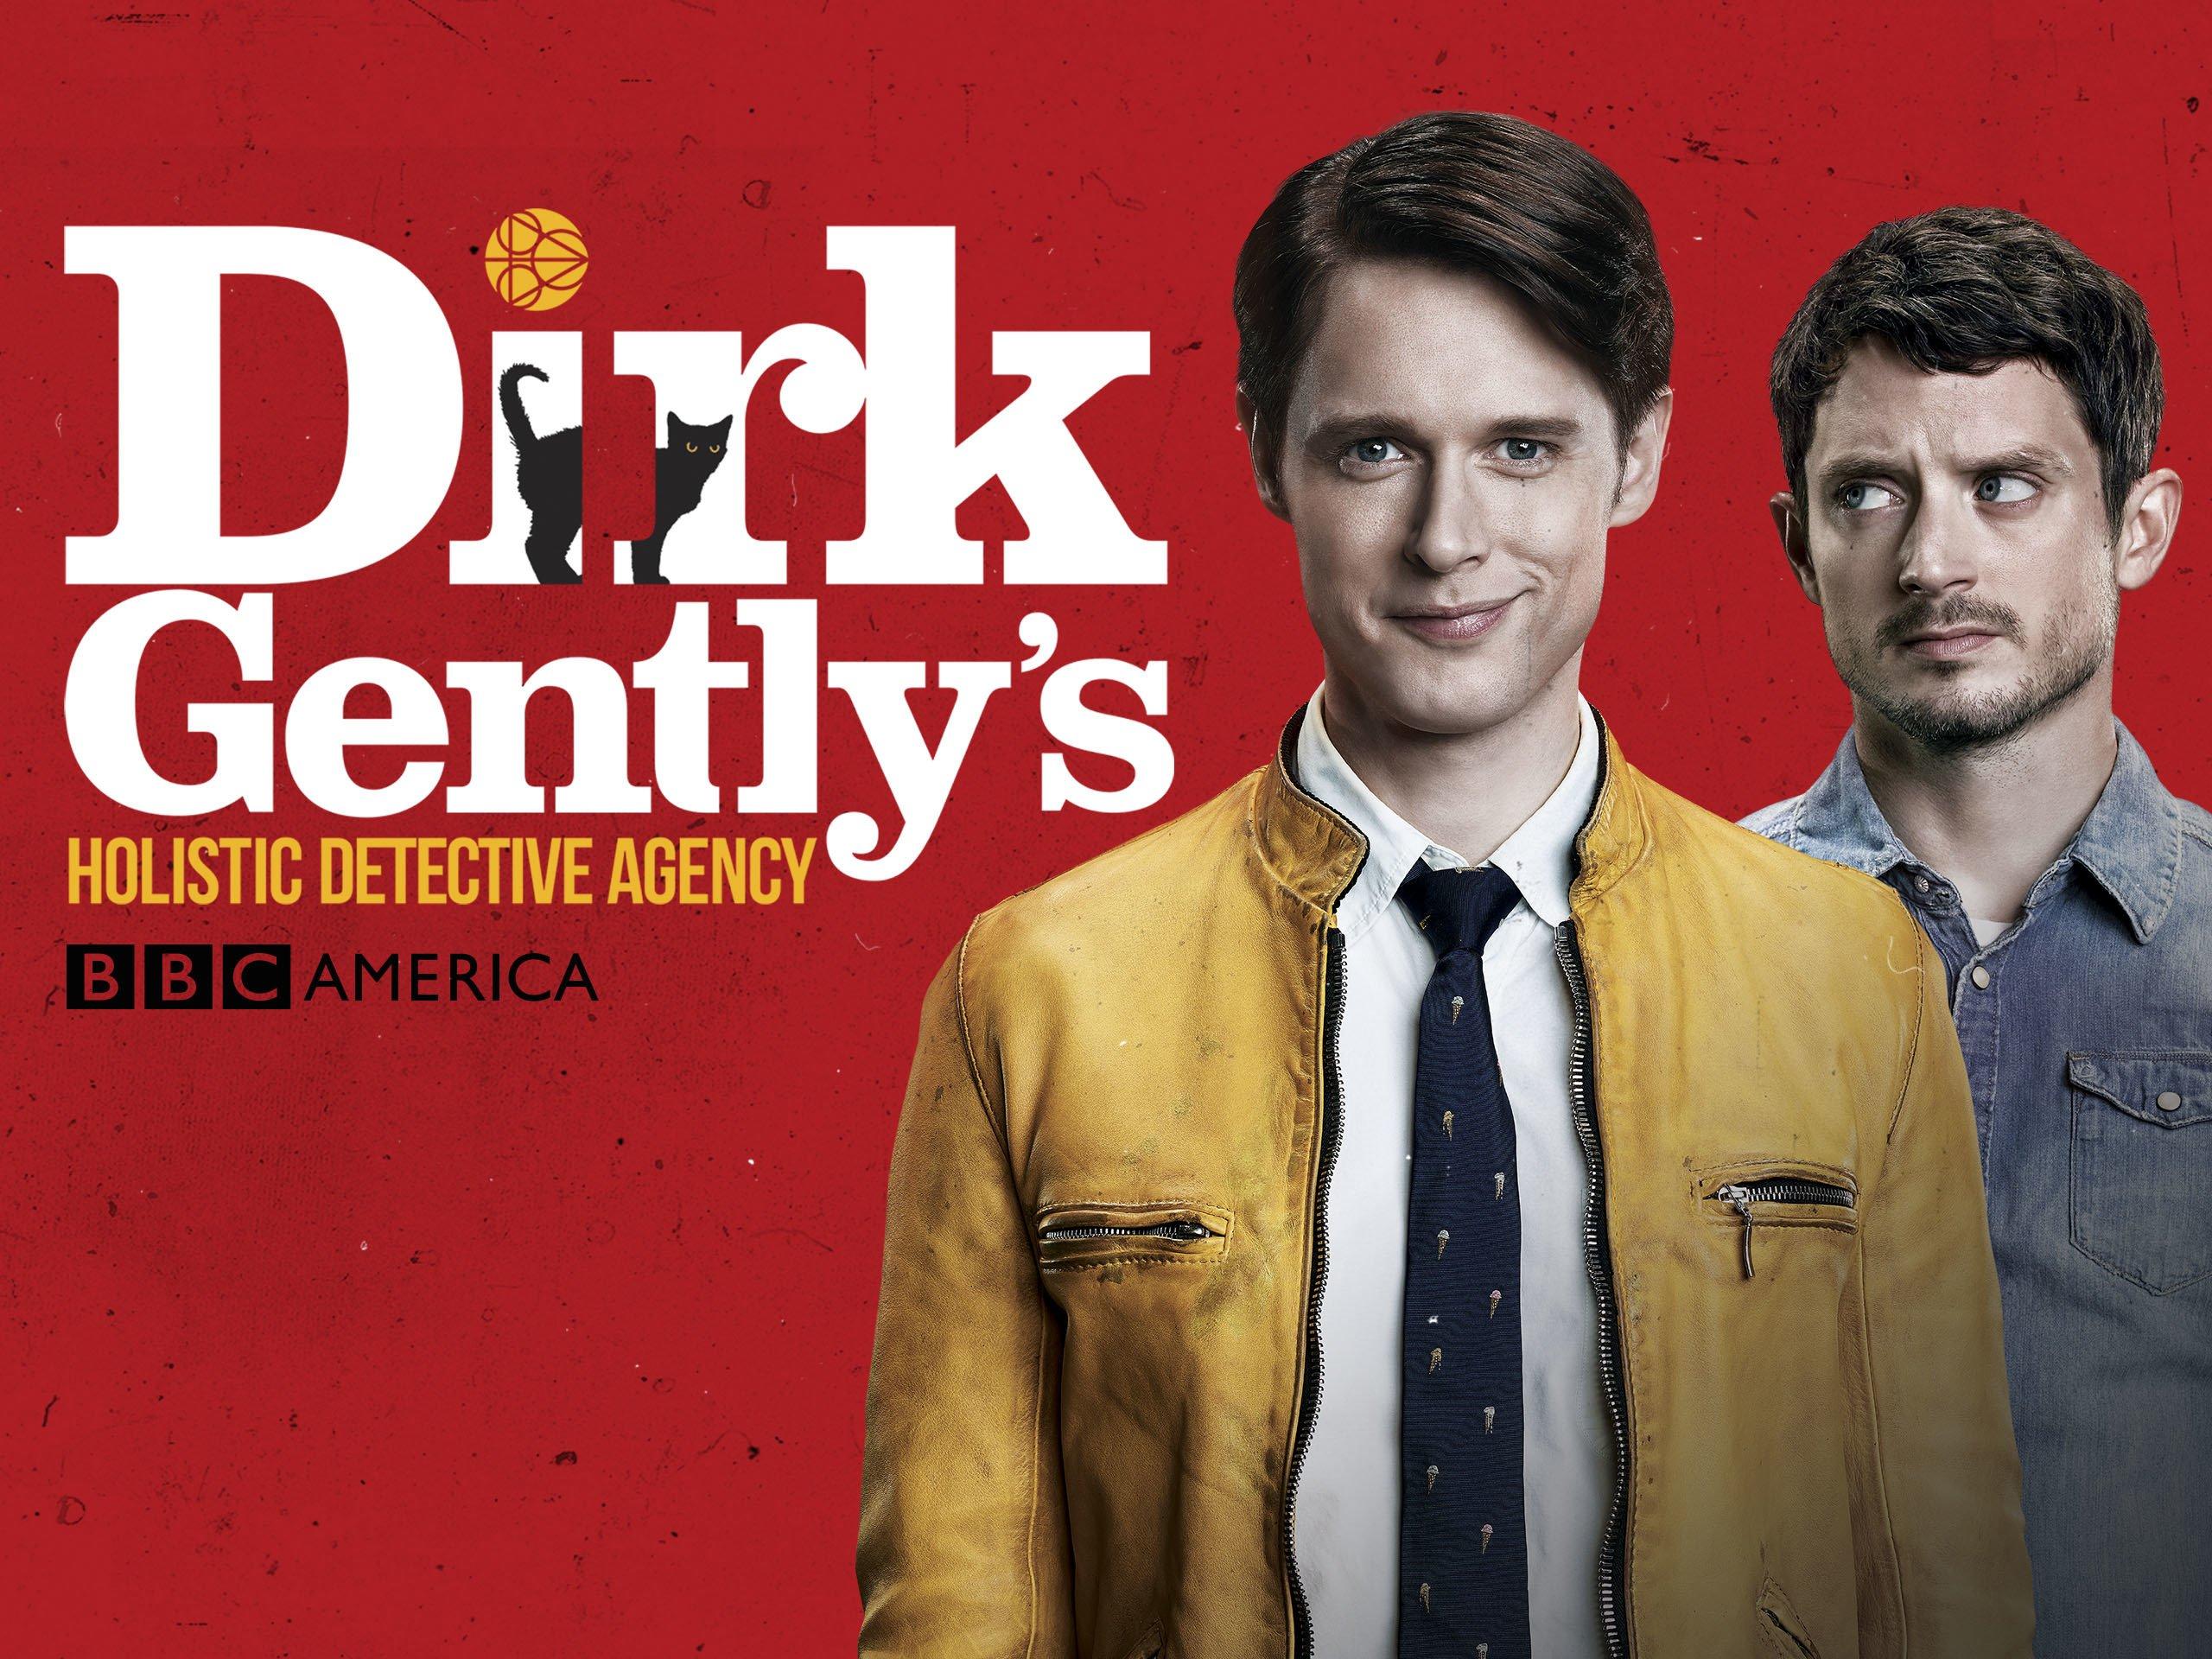 dirk gentlys holistic detective agency season 2 episode 2 full episode